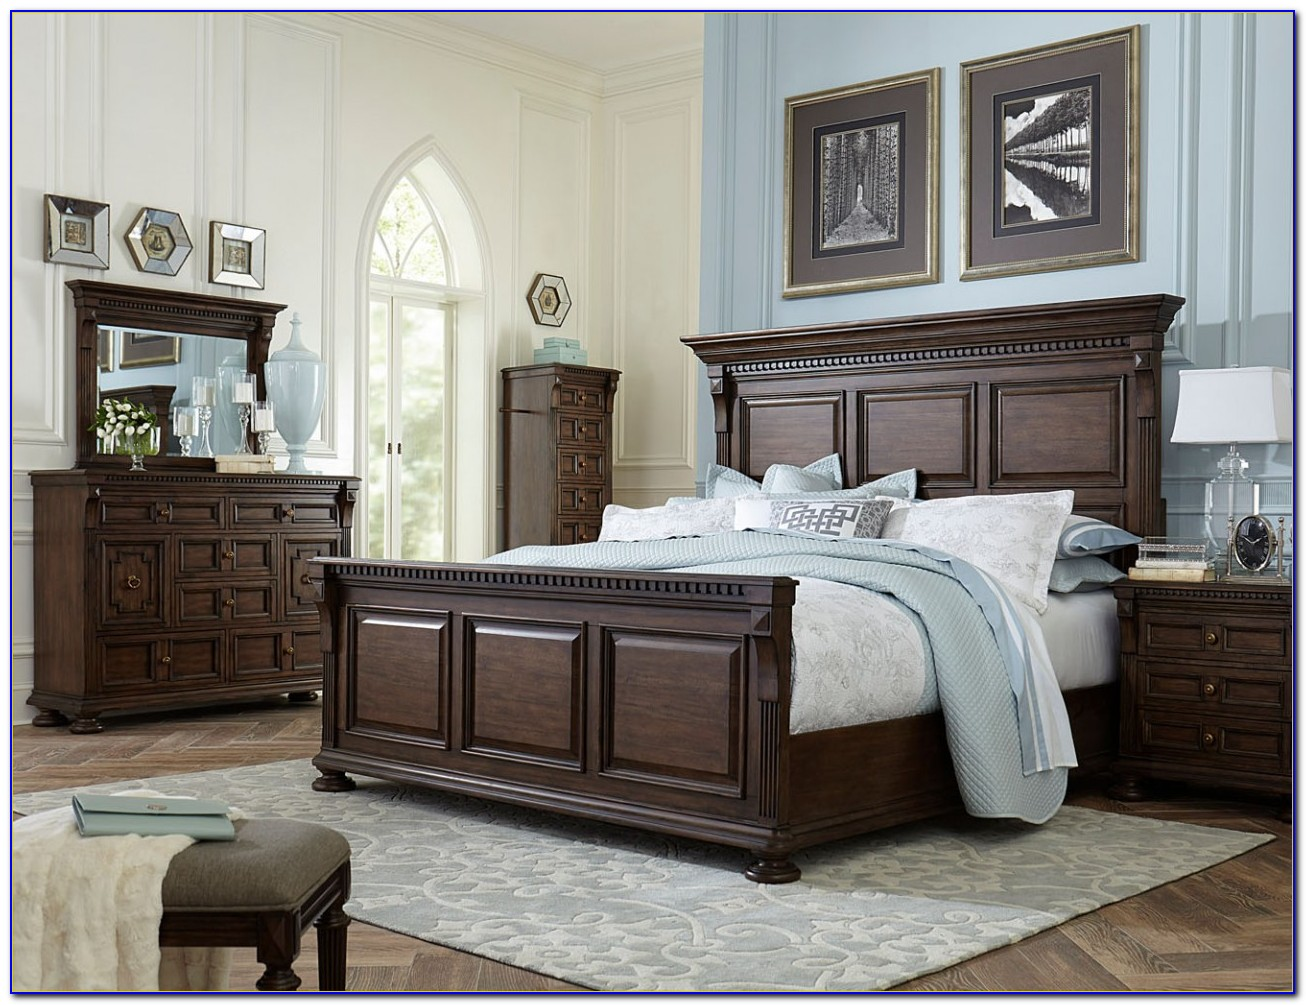 Broyhill Bedroom Furniture Hardware